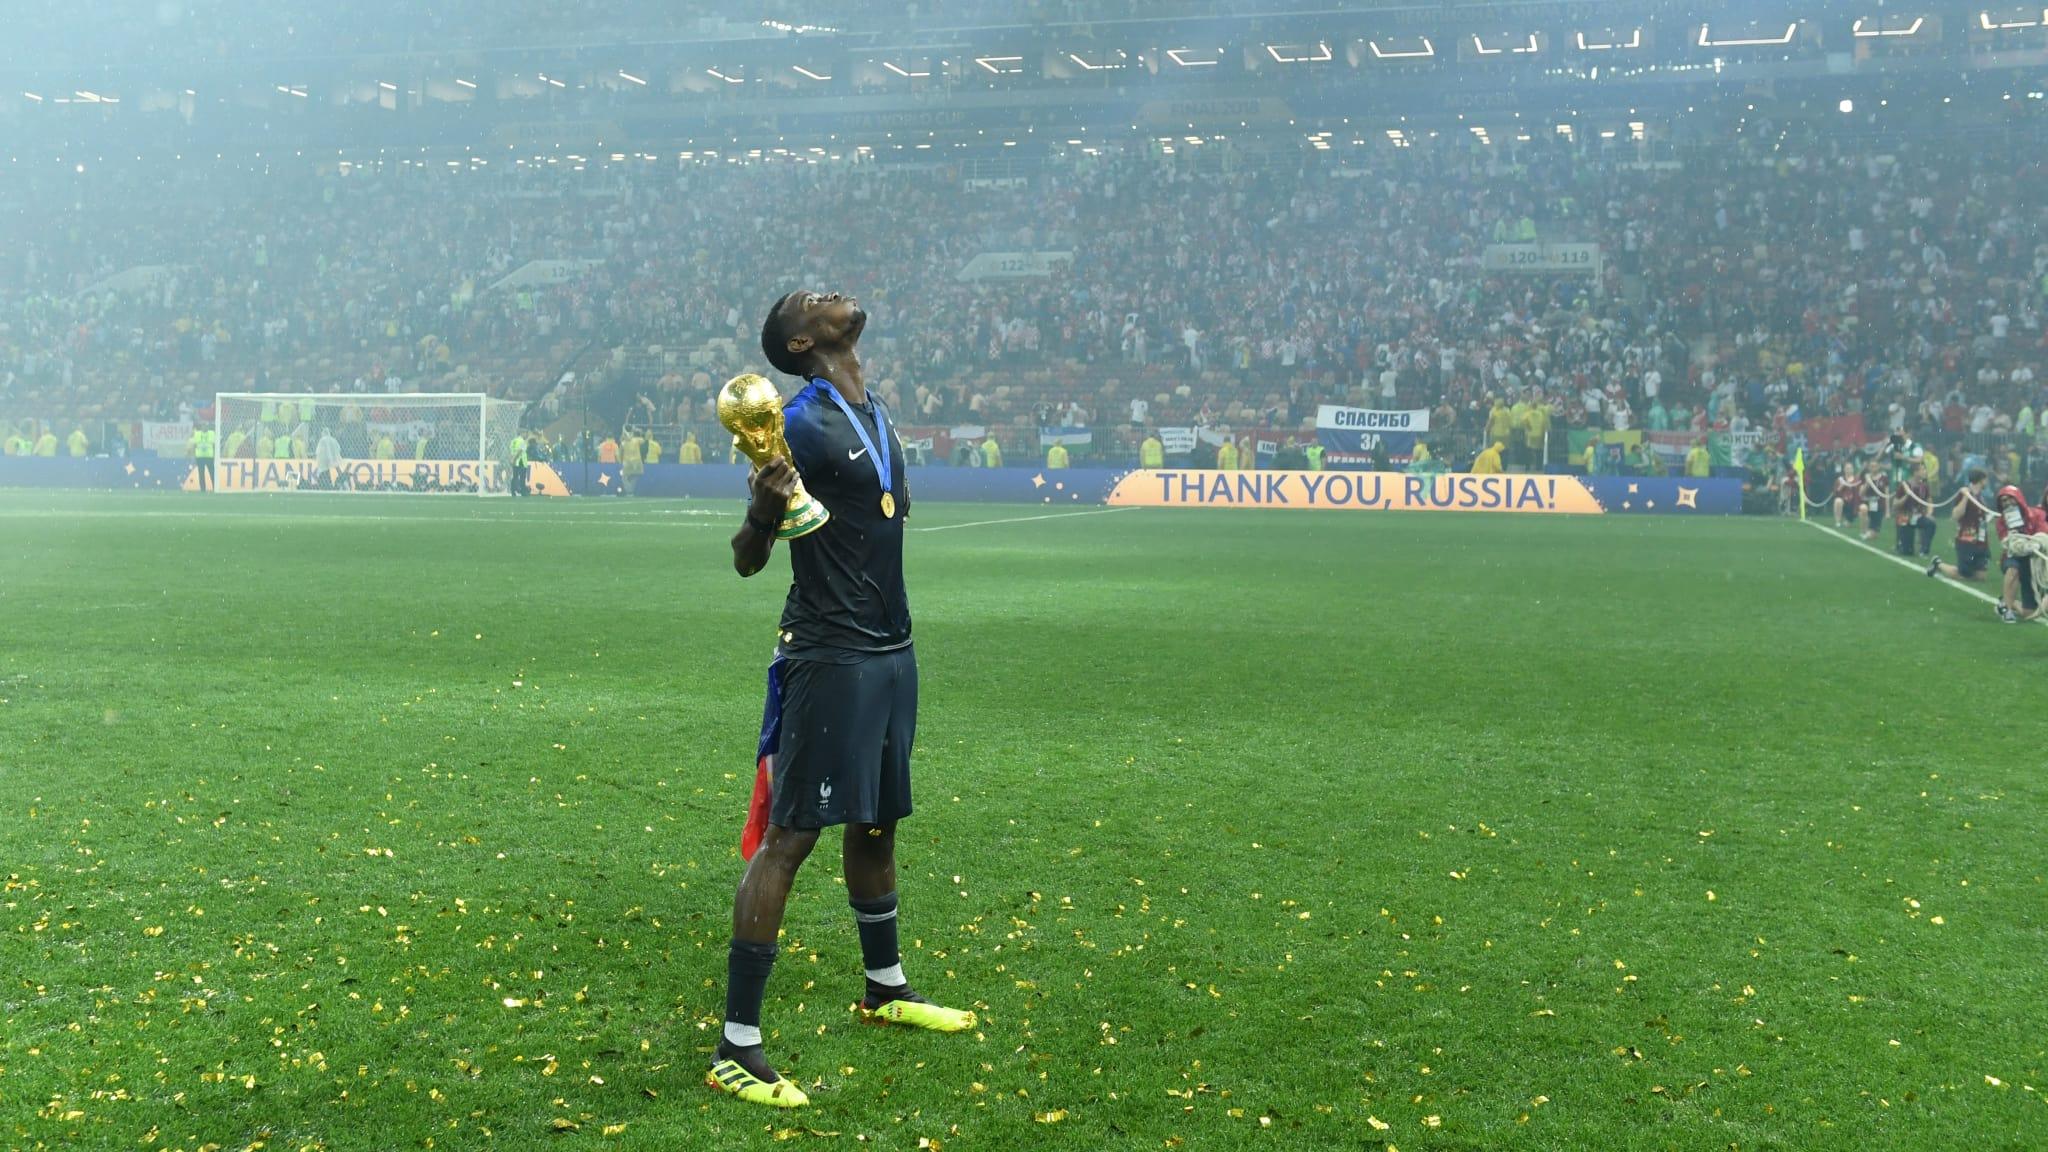 France V Croatia - Fifa World Cup 2018 Best Moments , HD Wallpaper & Backgrounds